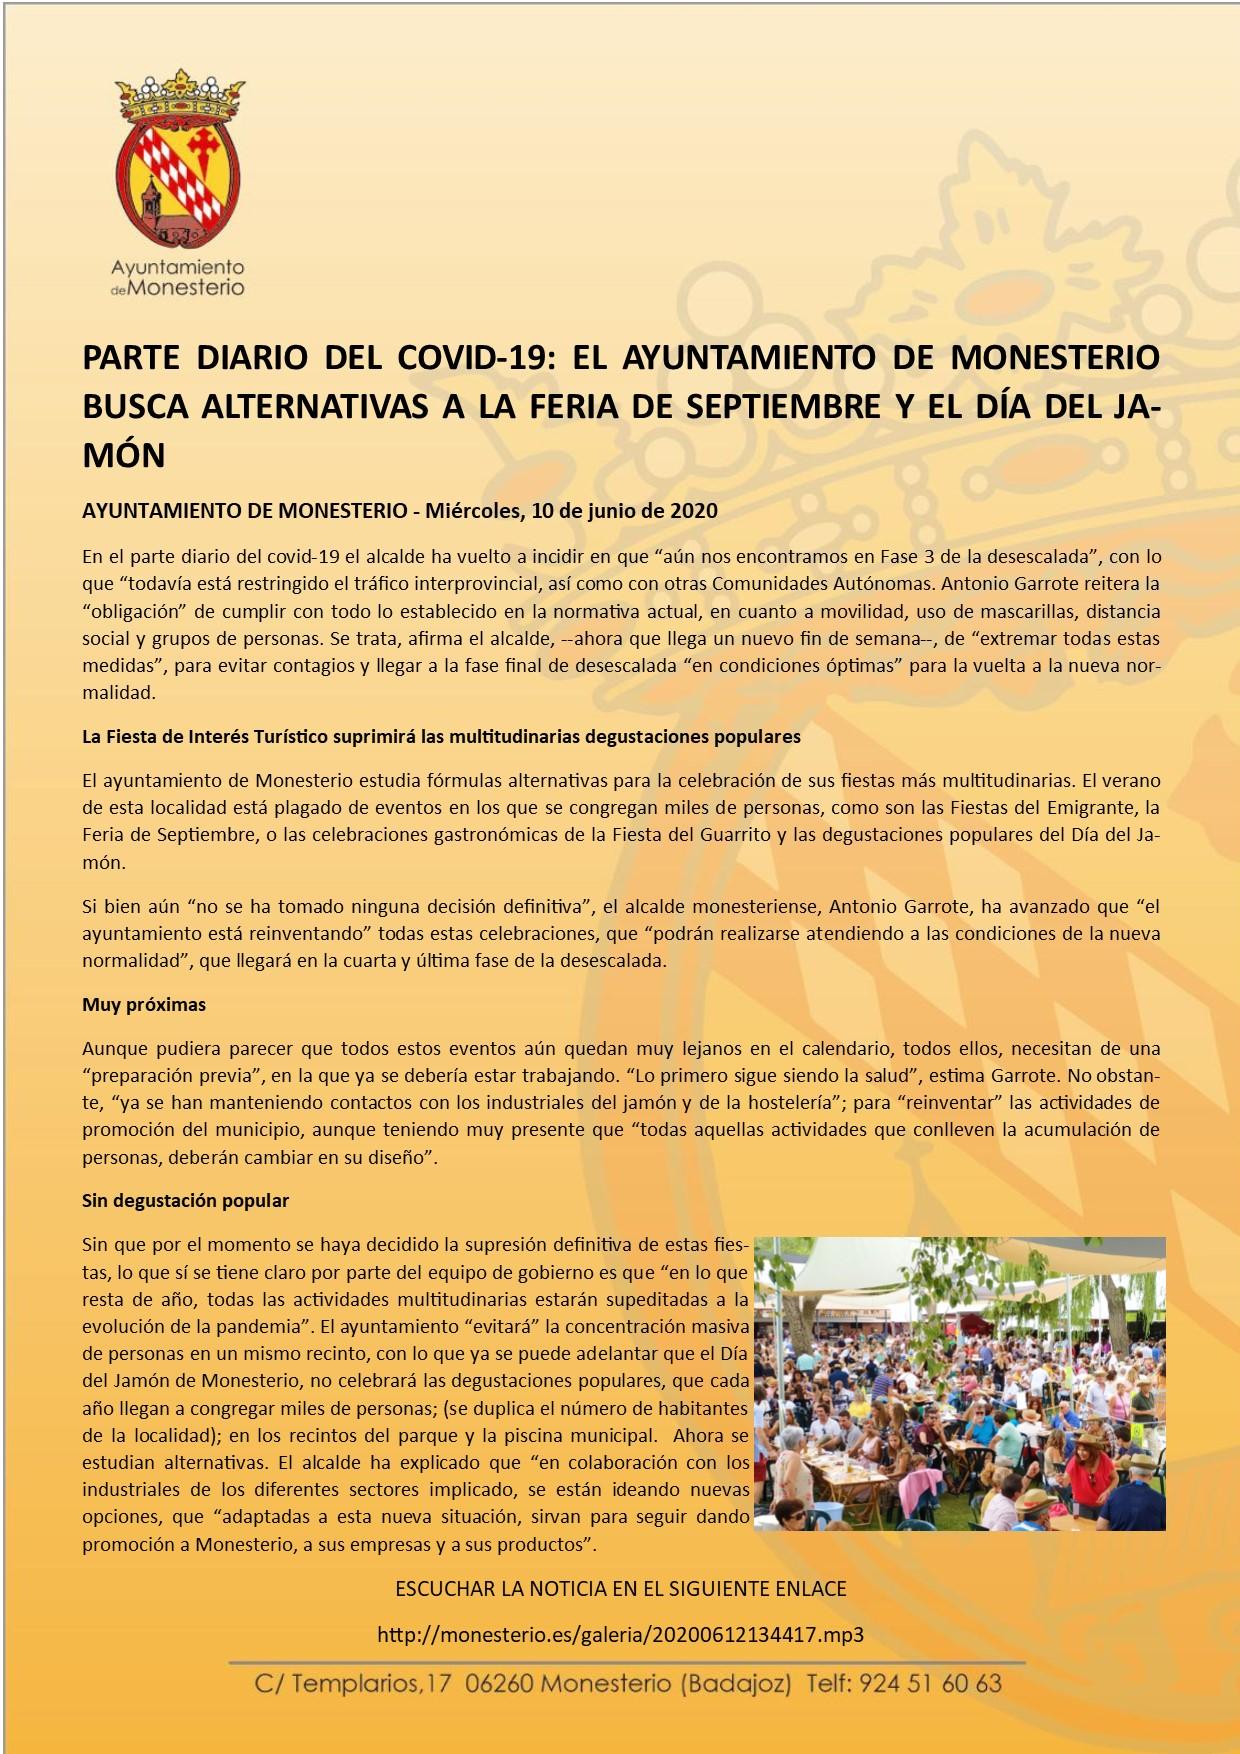 http://www.bandomovil.com/archivos/monesterio/120620120435_12_junio_parte.jpg